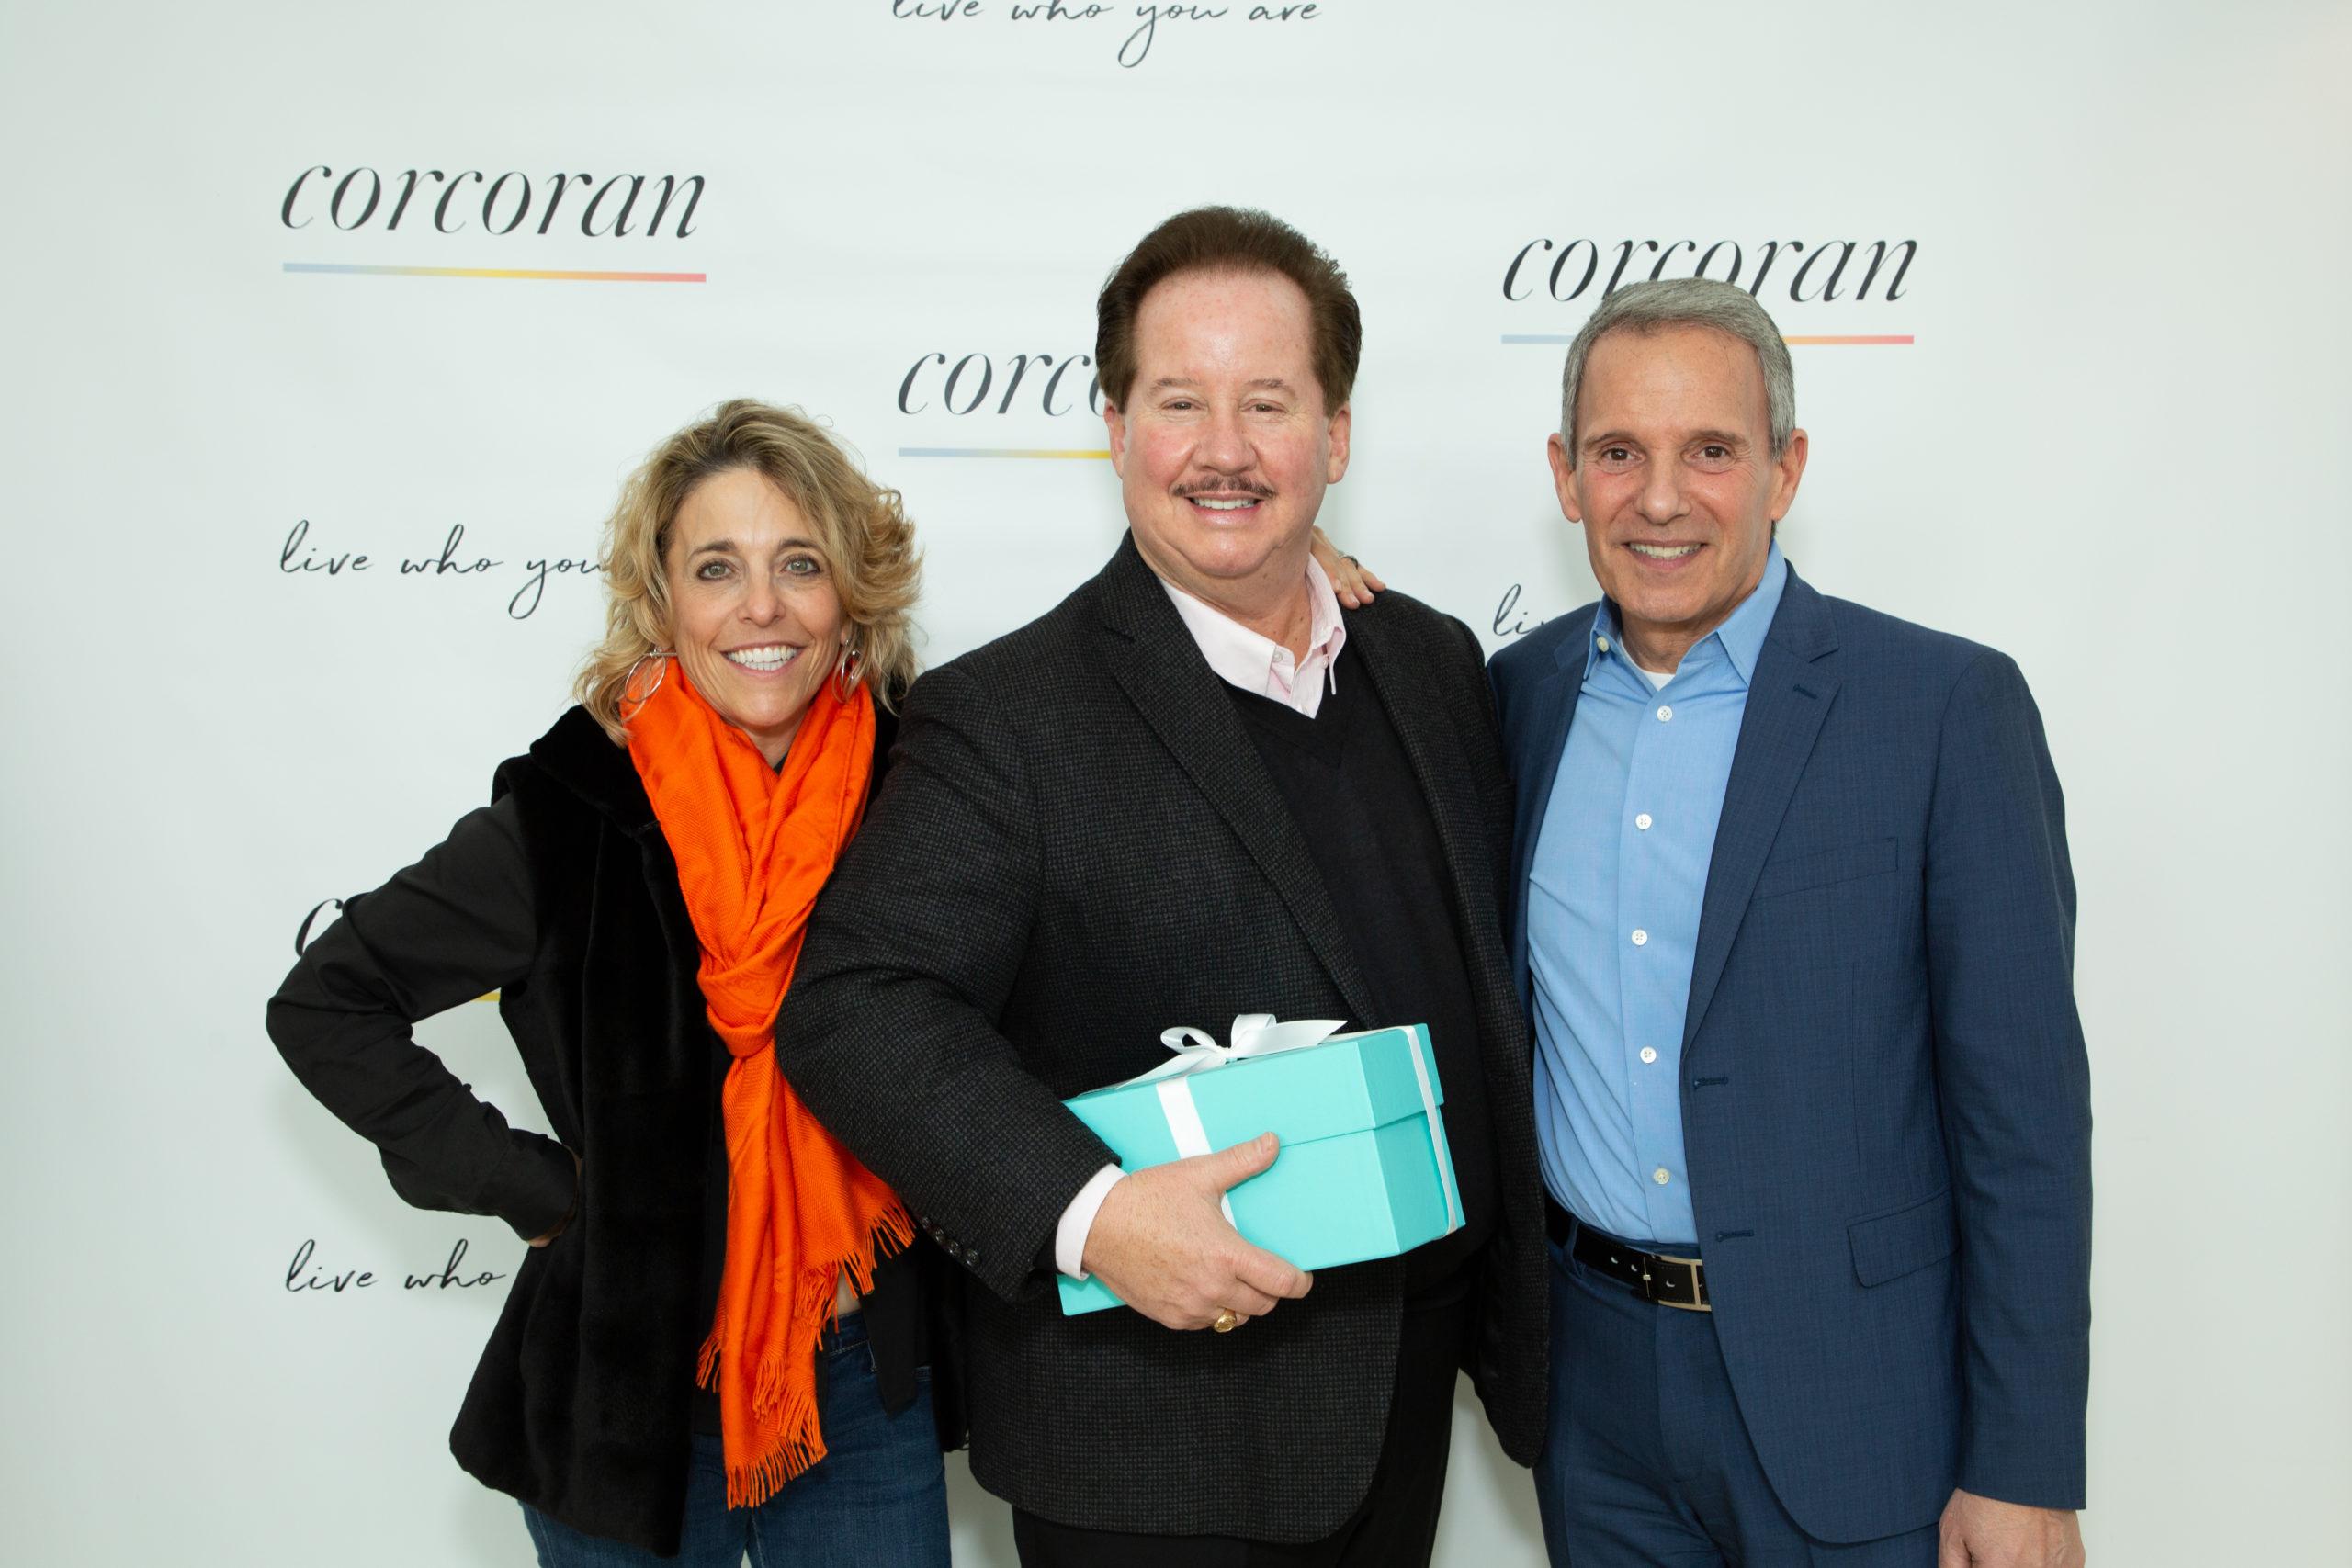 Pamela Liebman, Tim Davis and Ernie Cervi. COURTESY CORCORAN